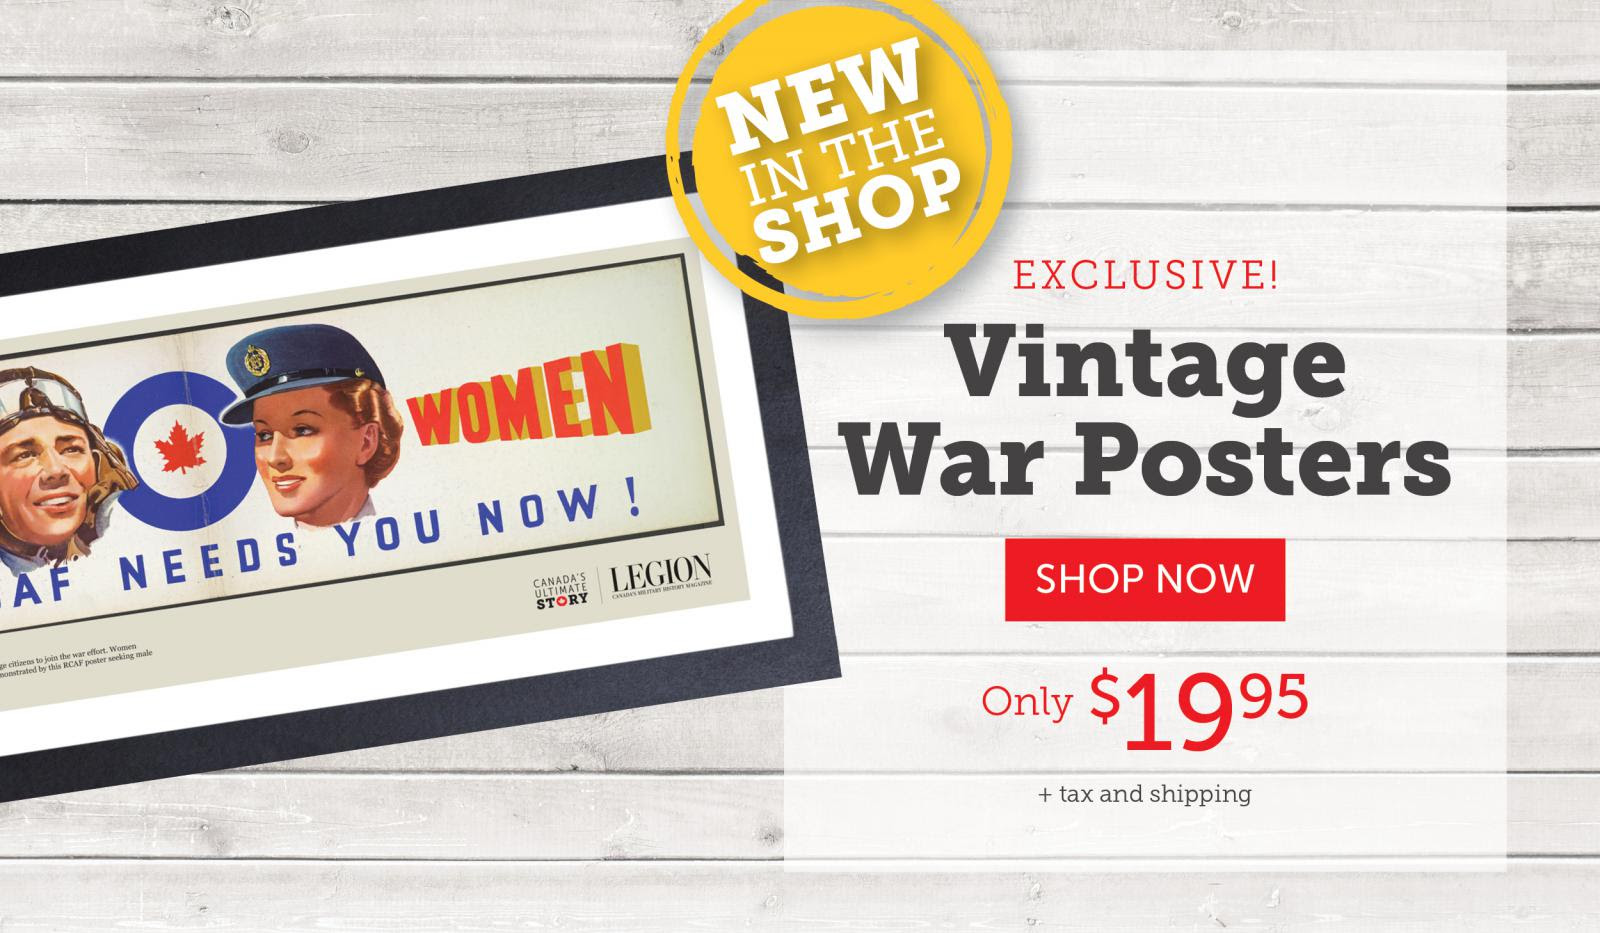 Vintage War Posters!